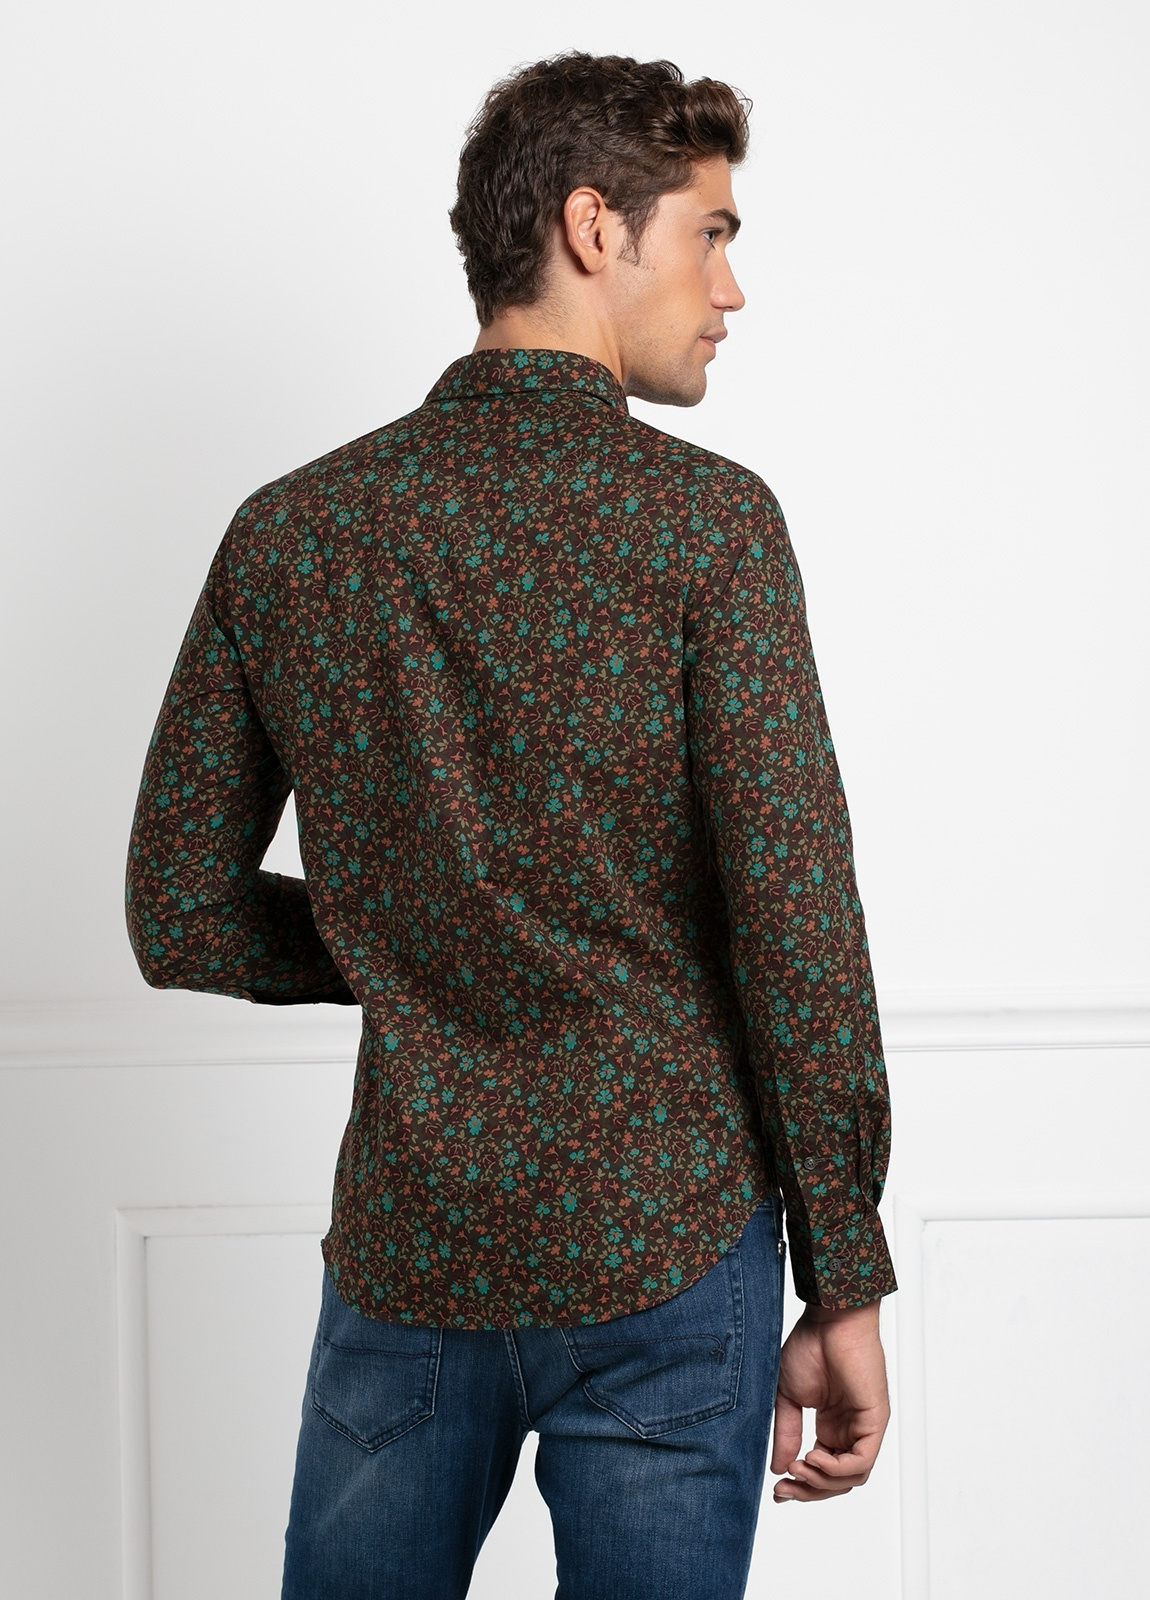 Camisa sport SLIM FIT modelo LEO estampado floral fondo marrón, 100% Algodón. - Ítem2